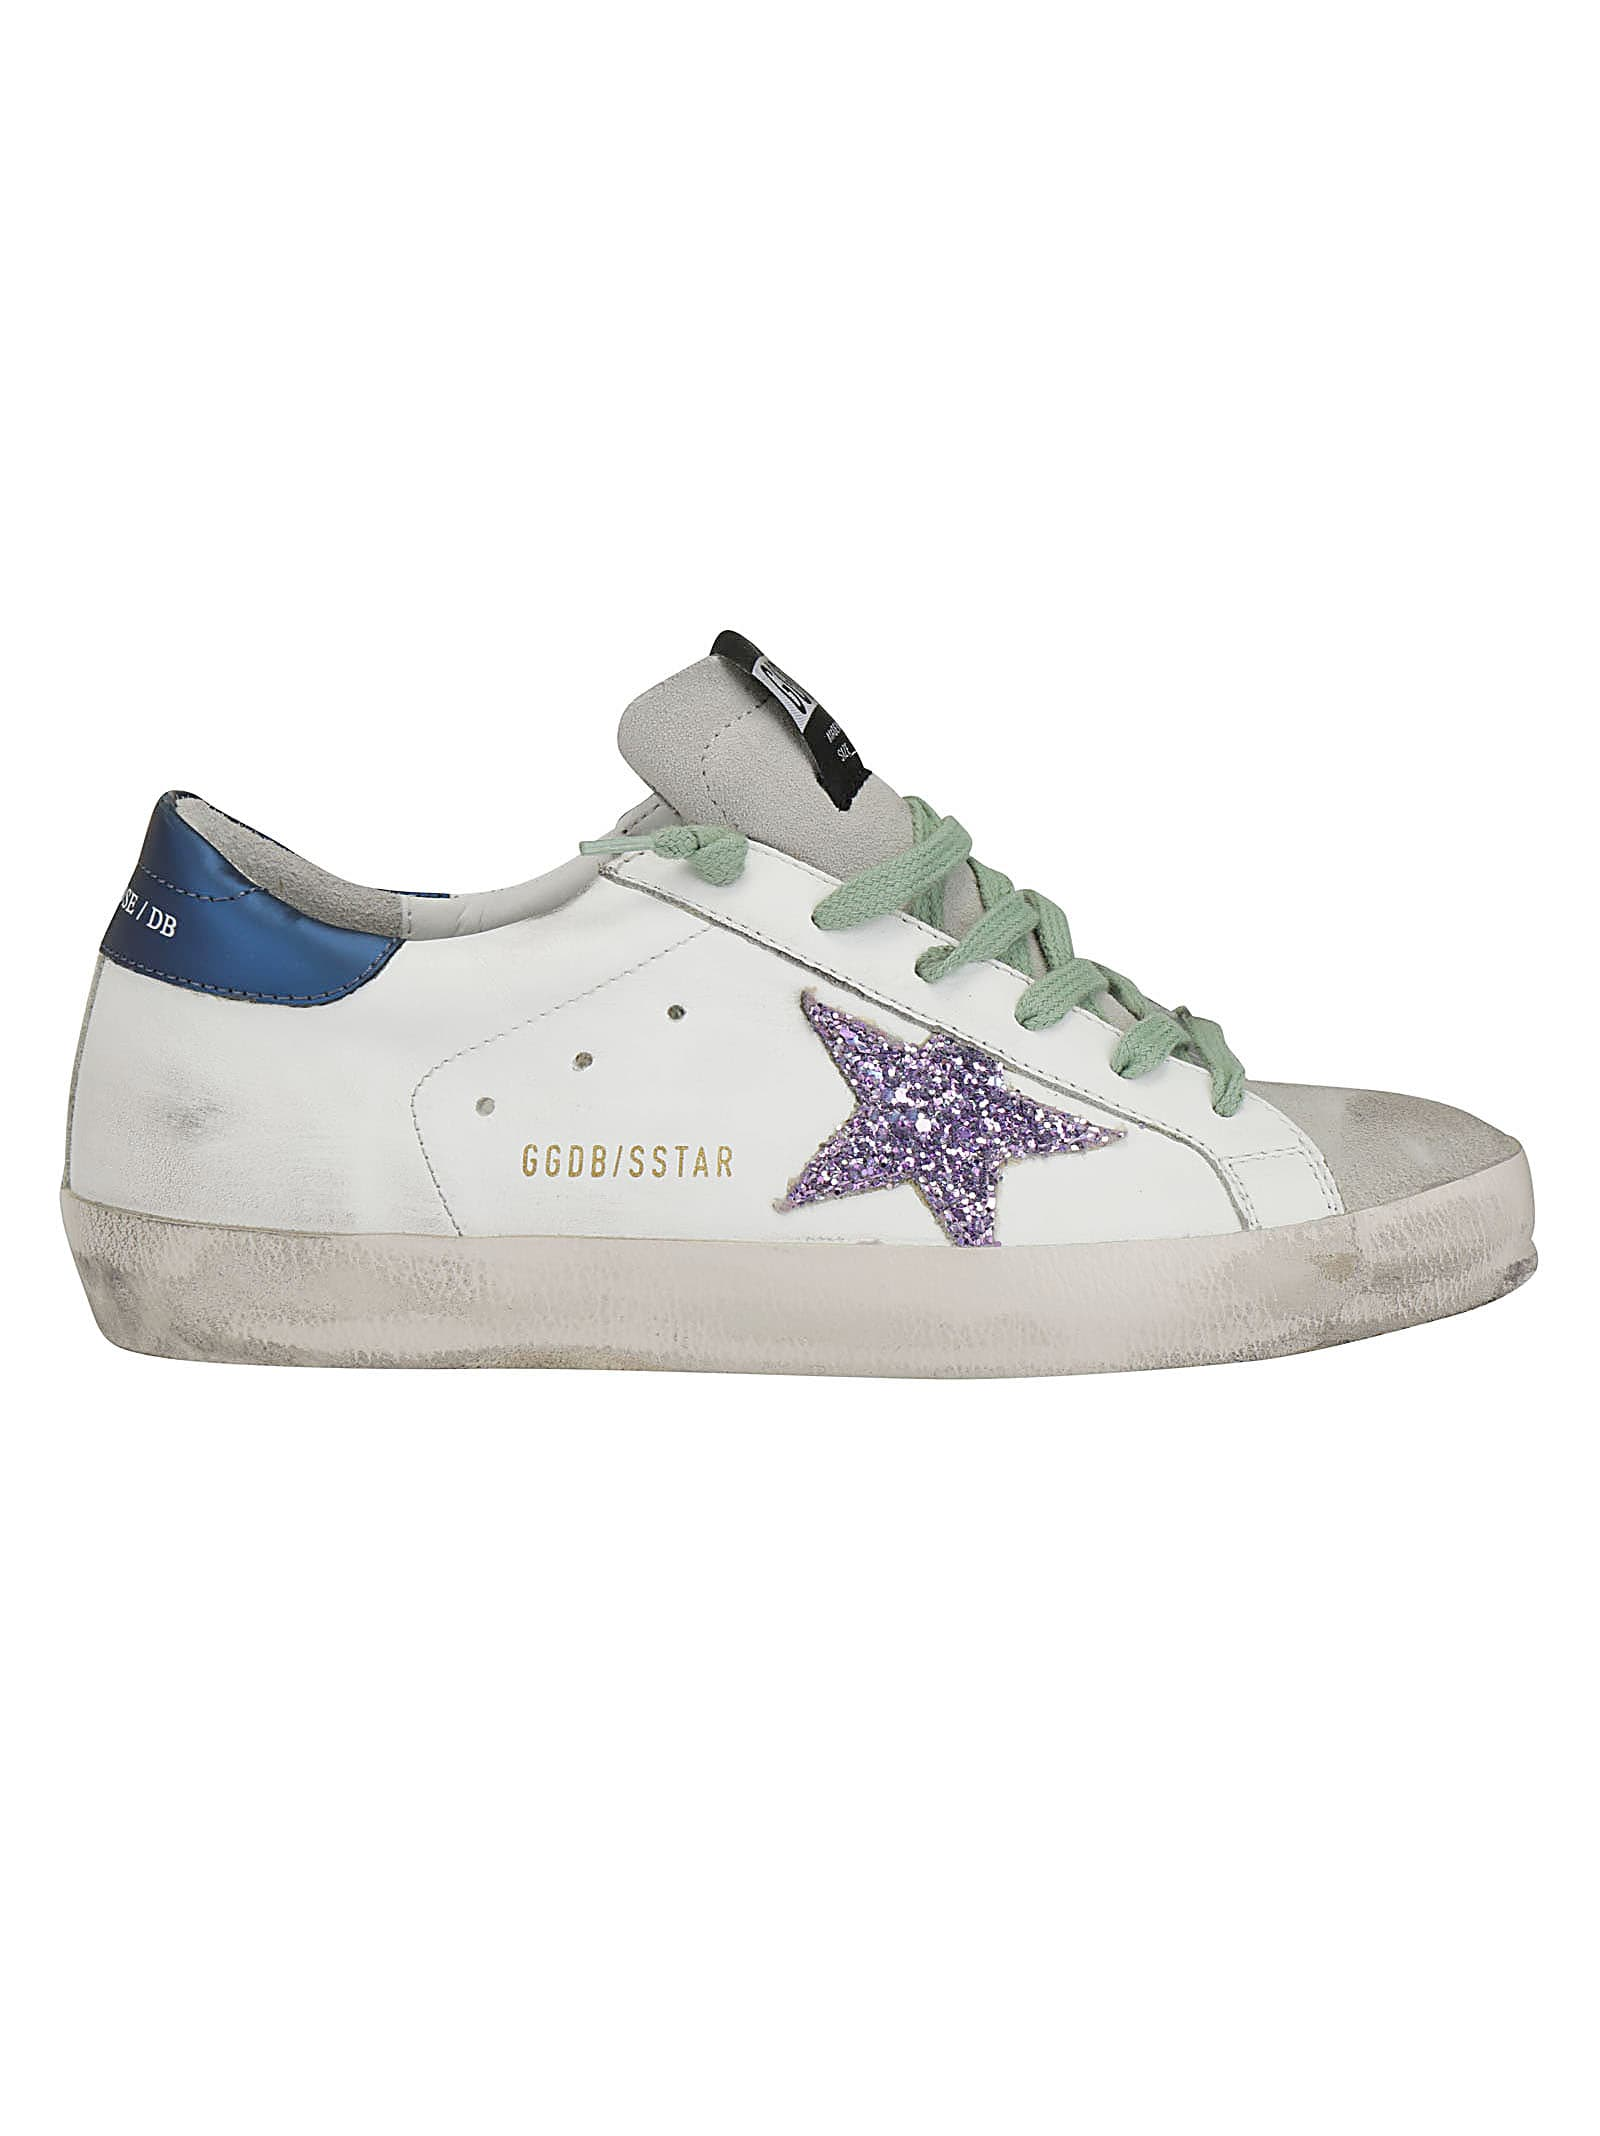 a8c40198ce6 Golden Goose Golden Goose Superstar Sneakers - White/blue/pink ...